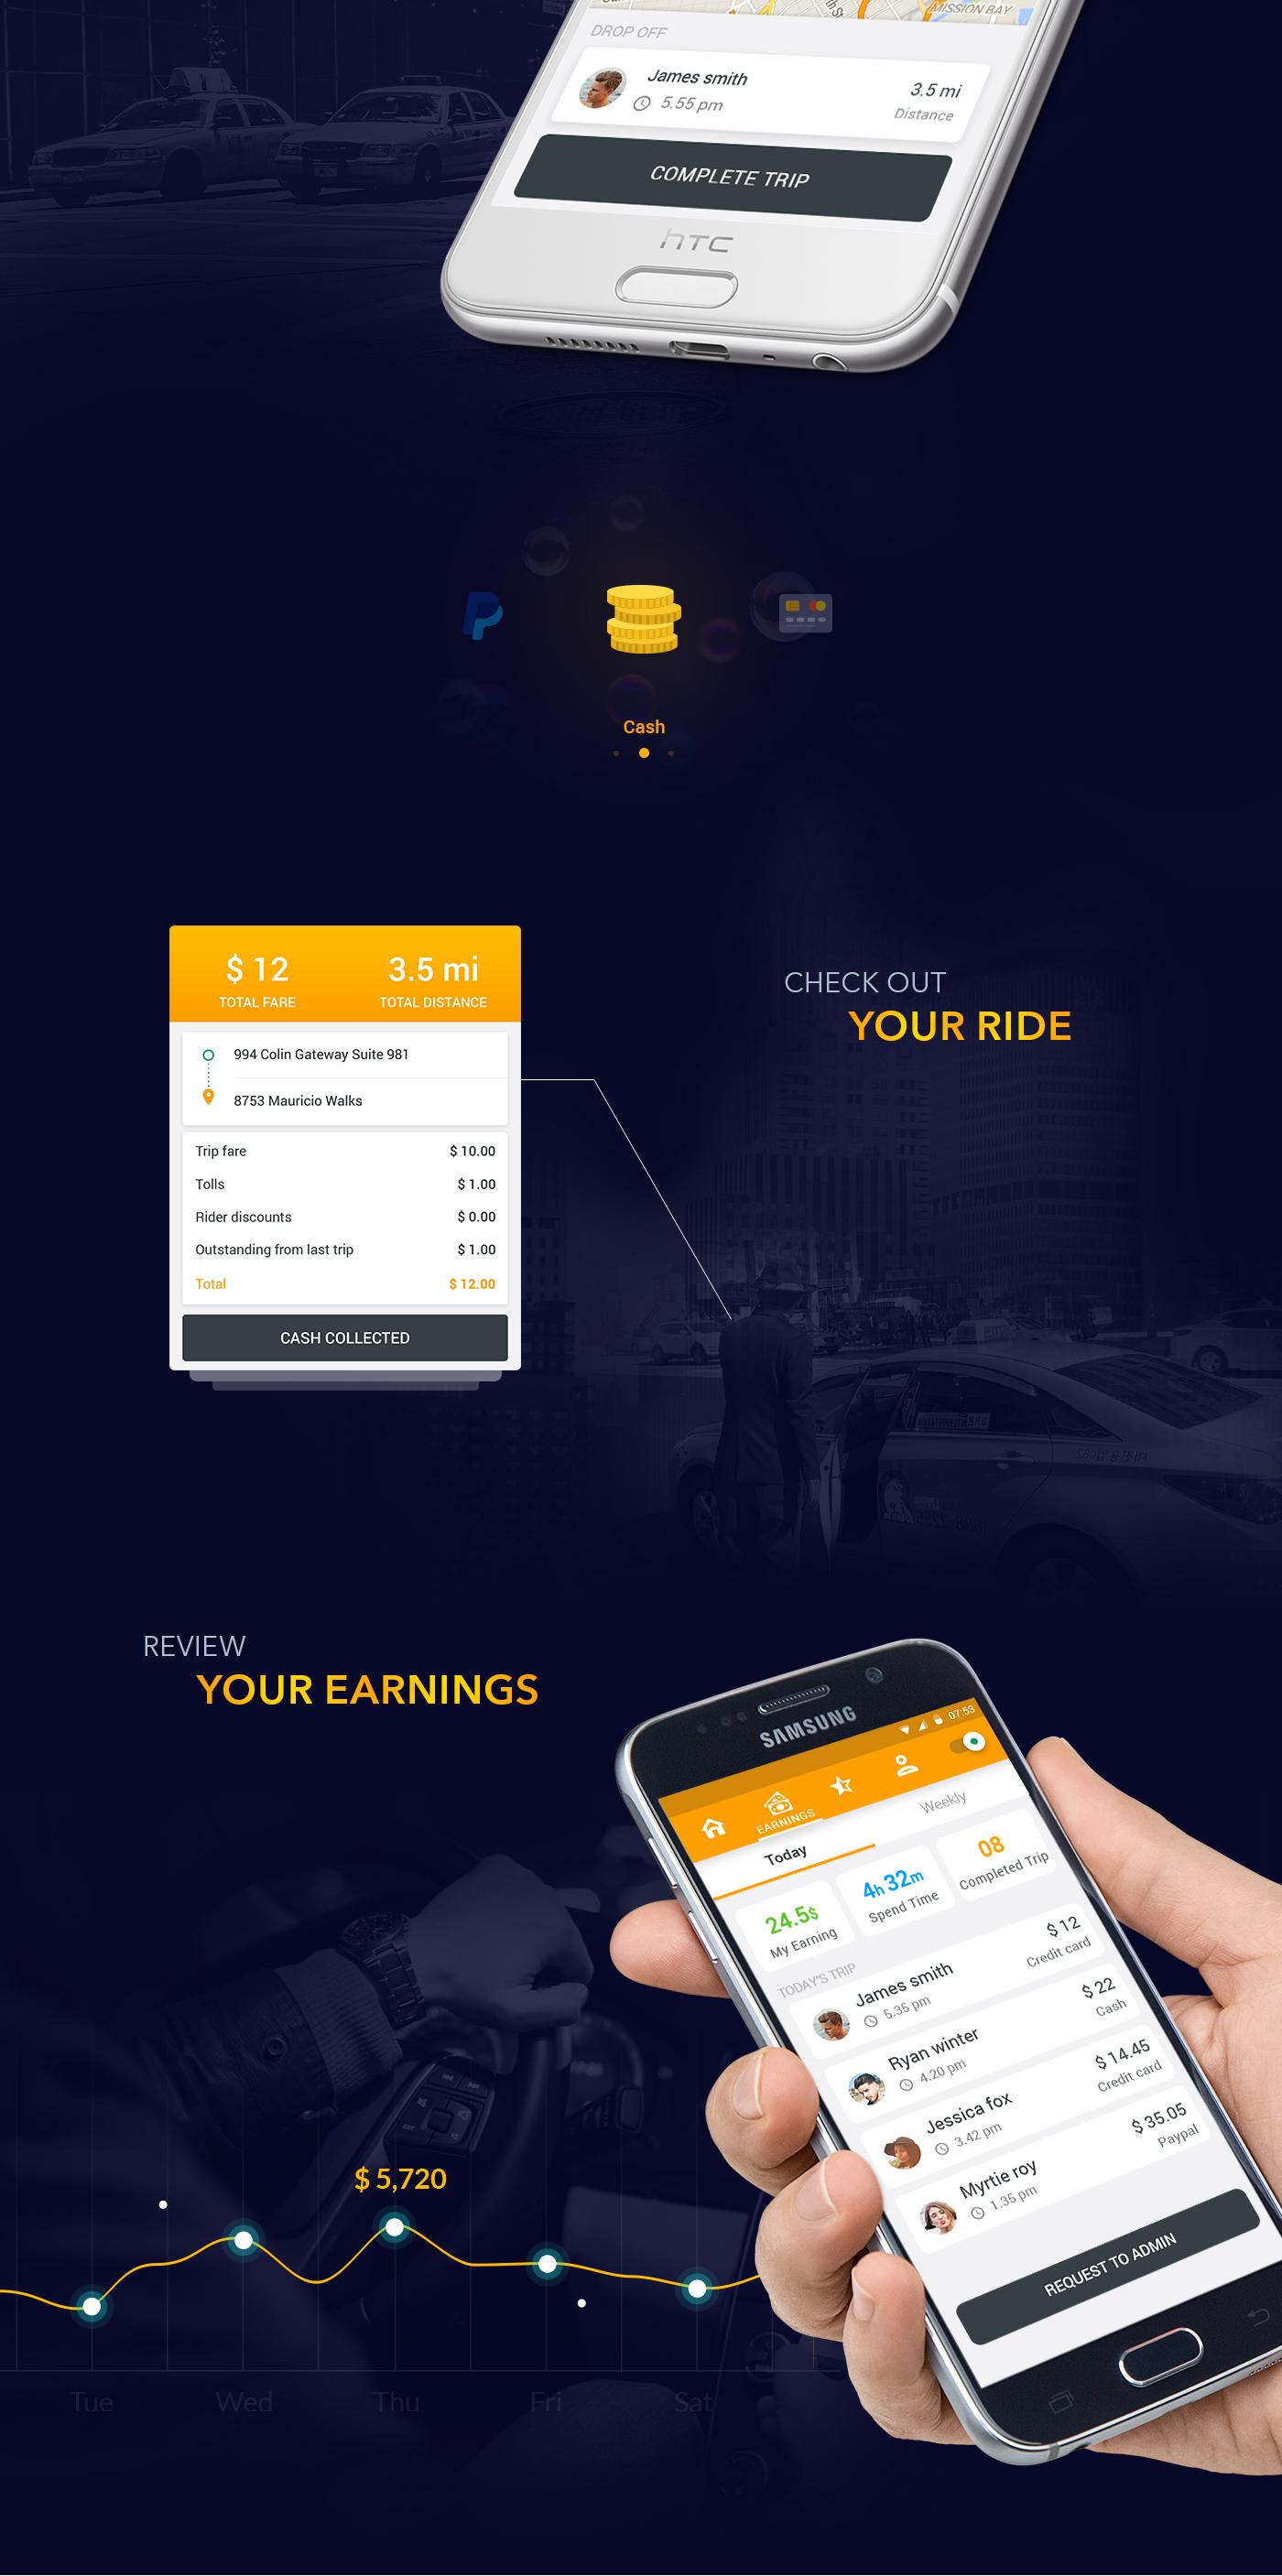 taxi app mobile Uber free psd material design download Christmas UI design